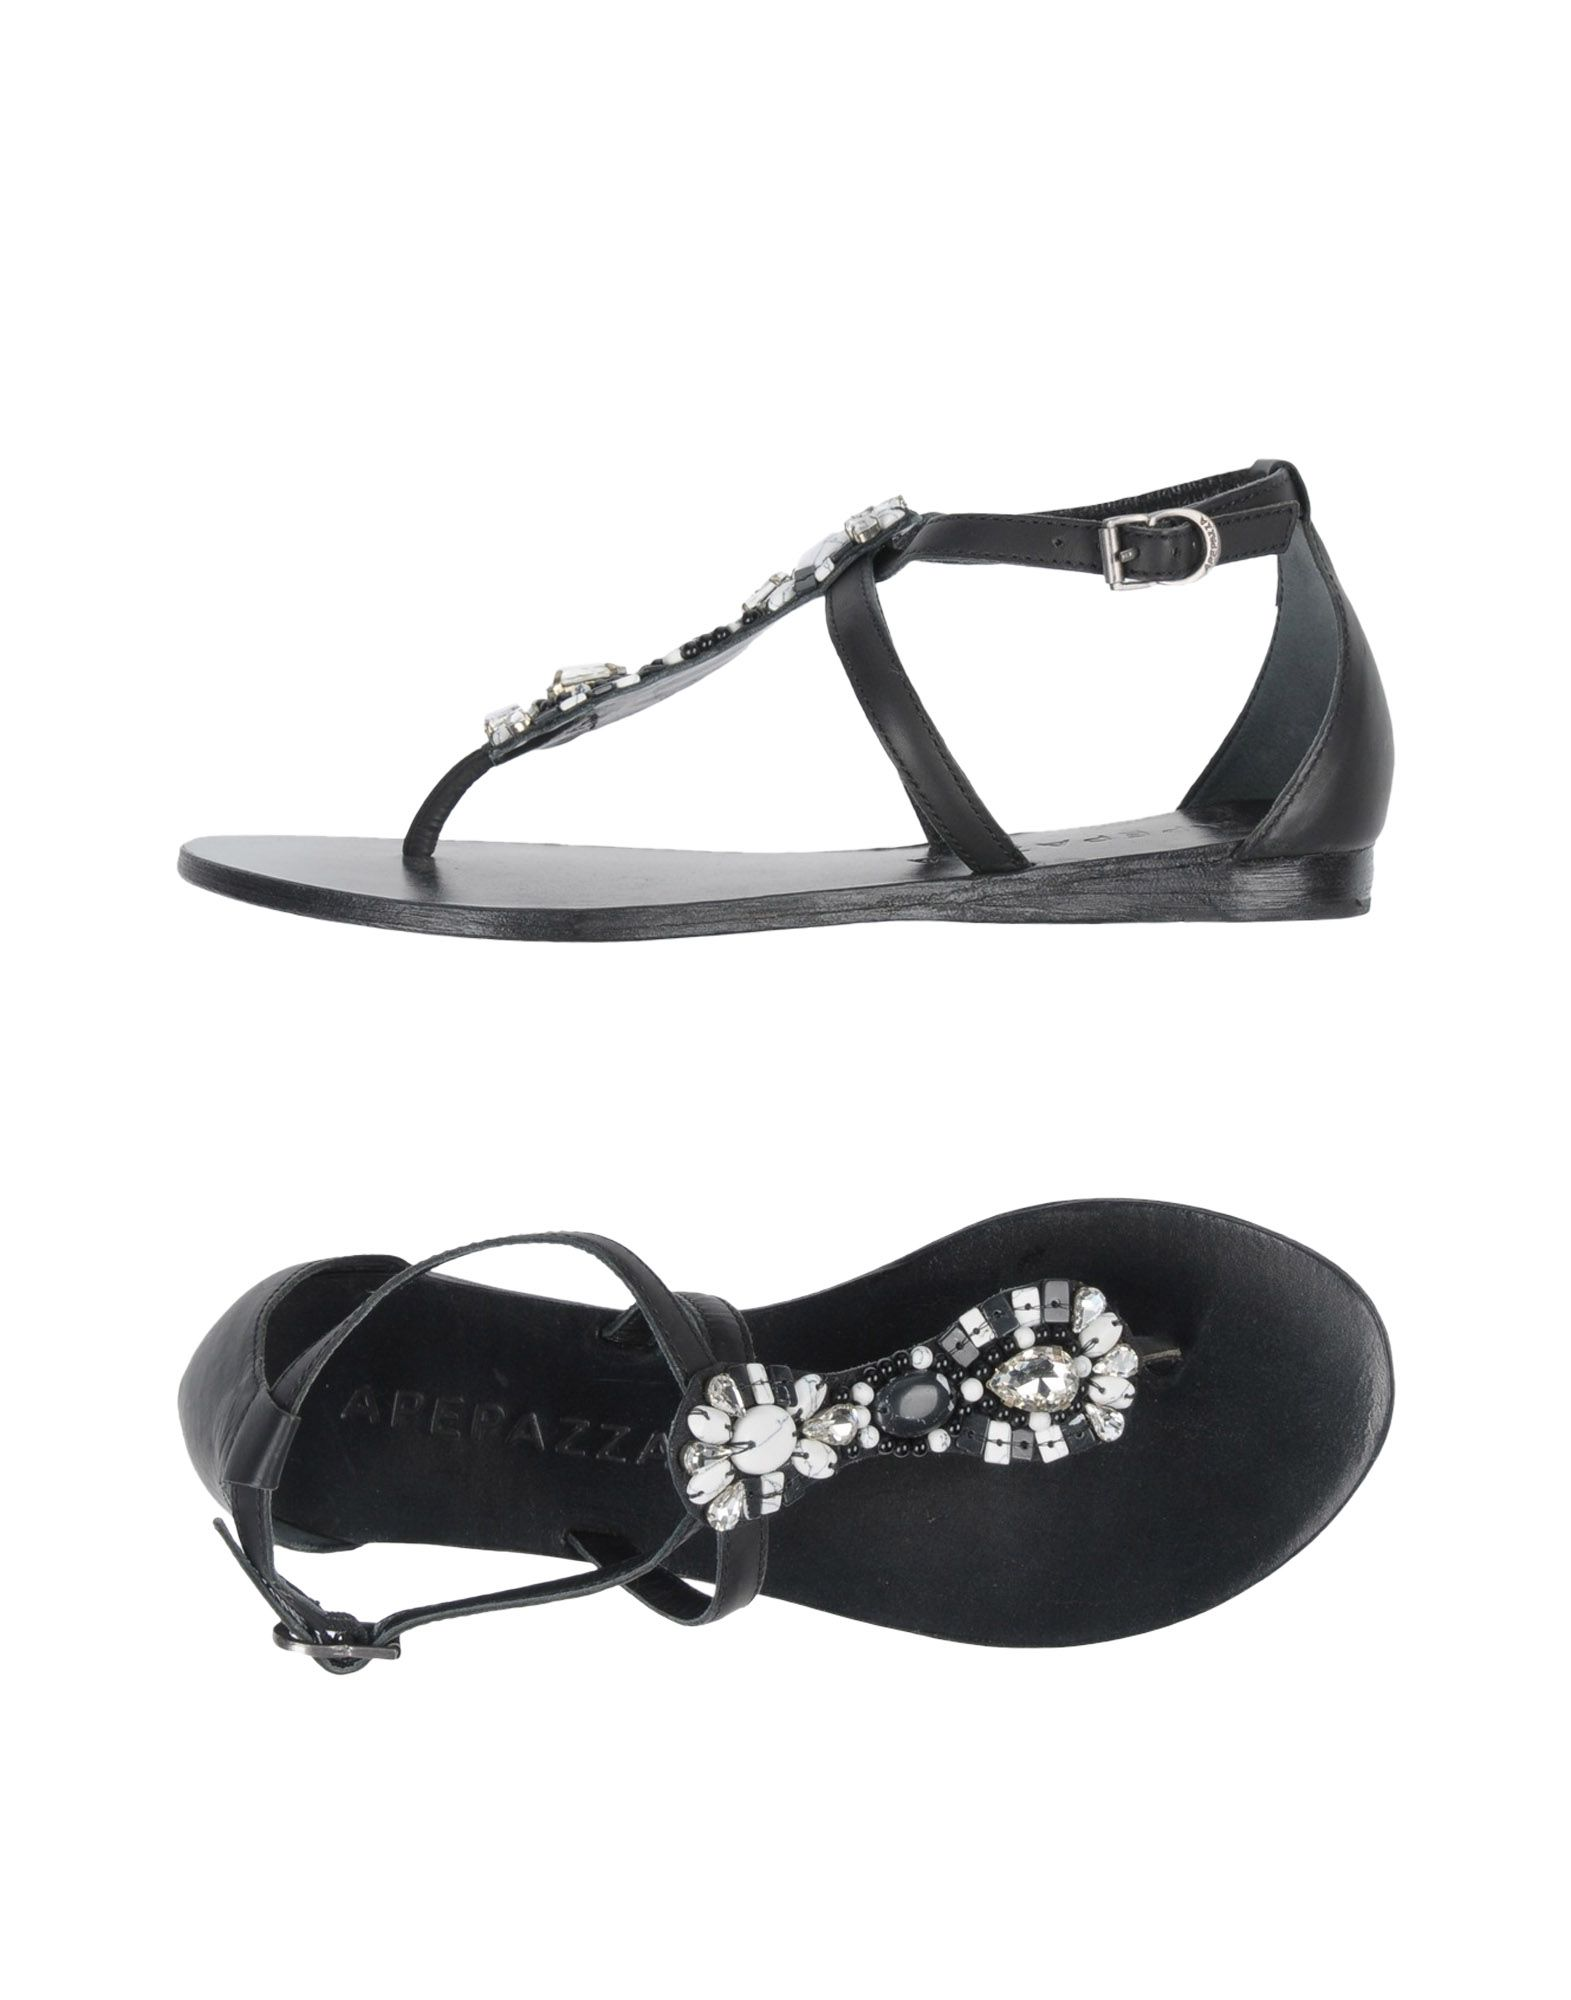 Apepazza Apepazza Flip Flops - Women Apepazza Apepazza Flip Flops online on  United Kingdom - 11481150SU 2e0bf4